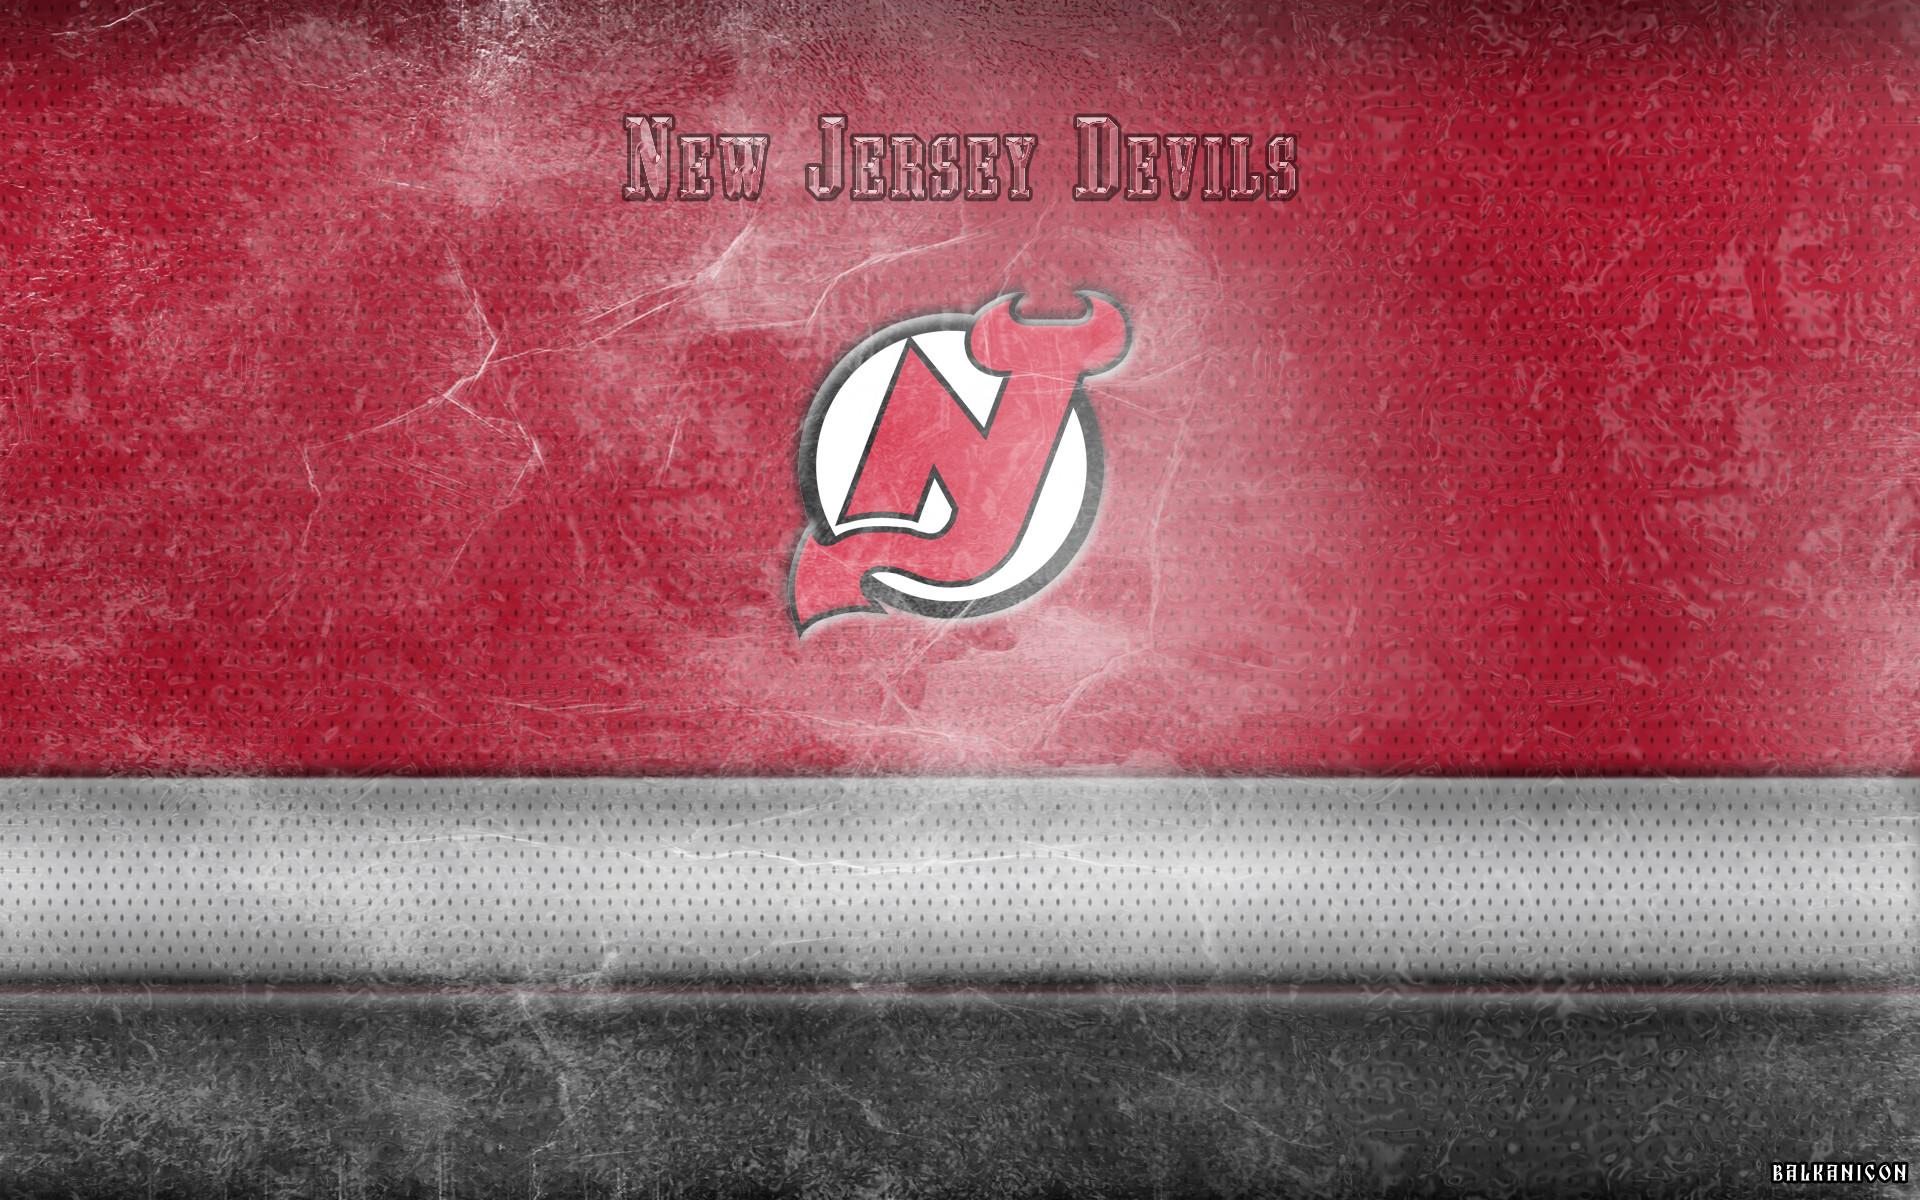 New Jersey Devils wallpaper by Balkanicon New Jersey Devils wallpaper by  Balkanicon